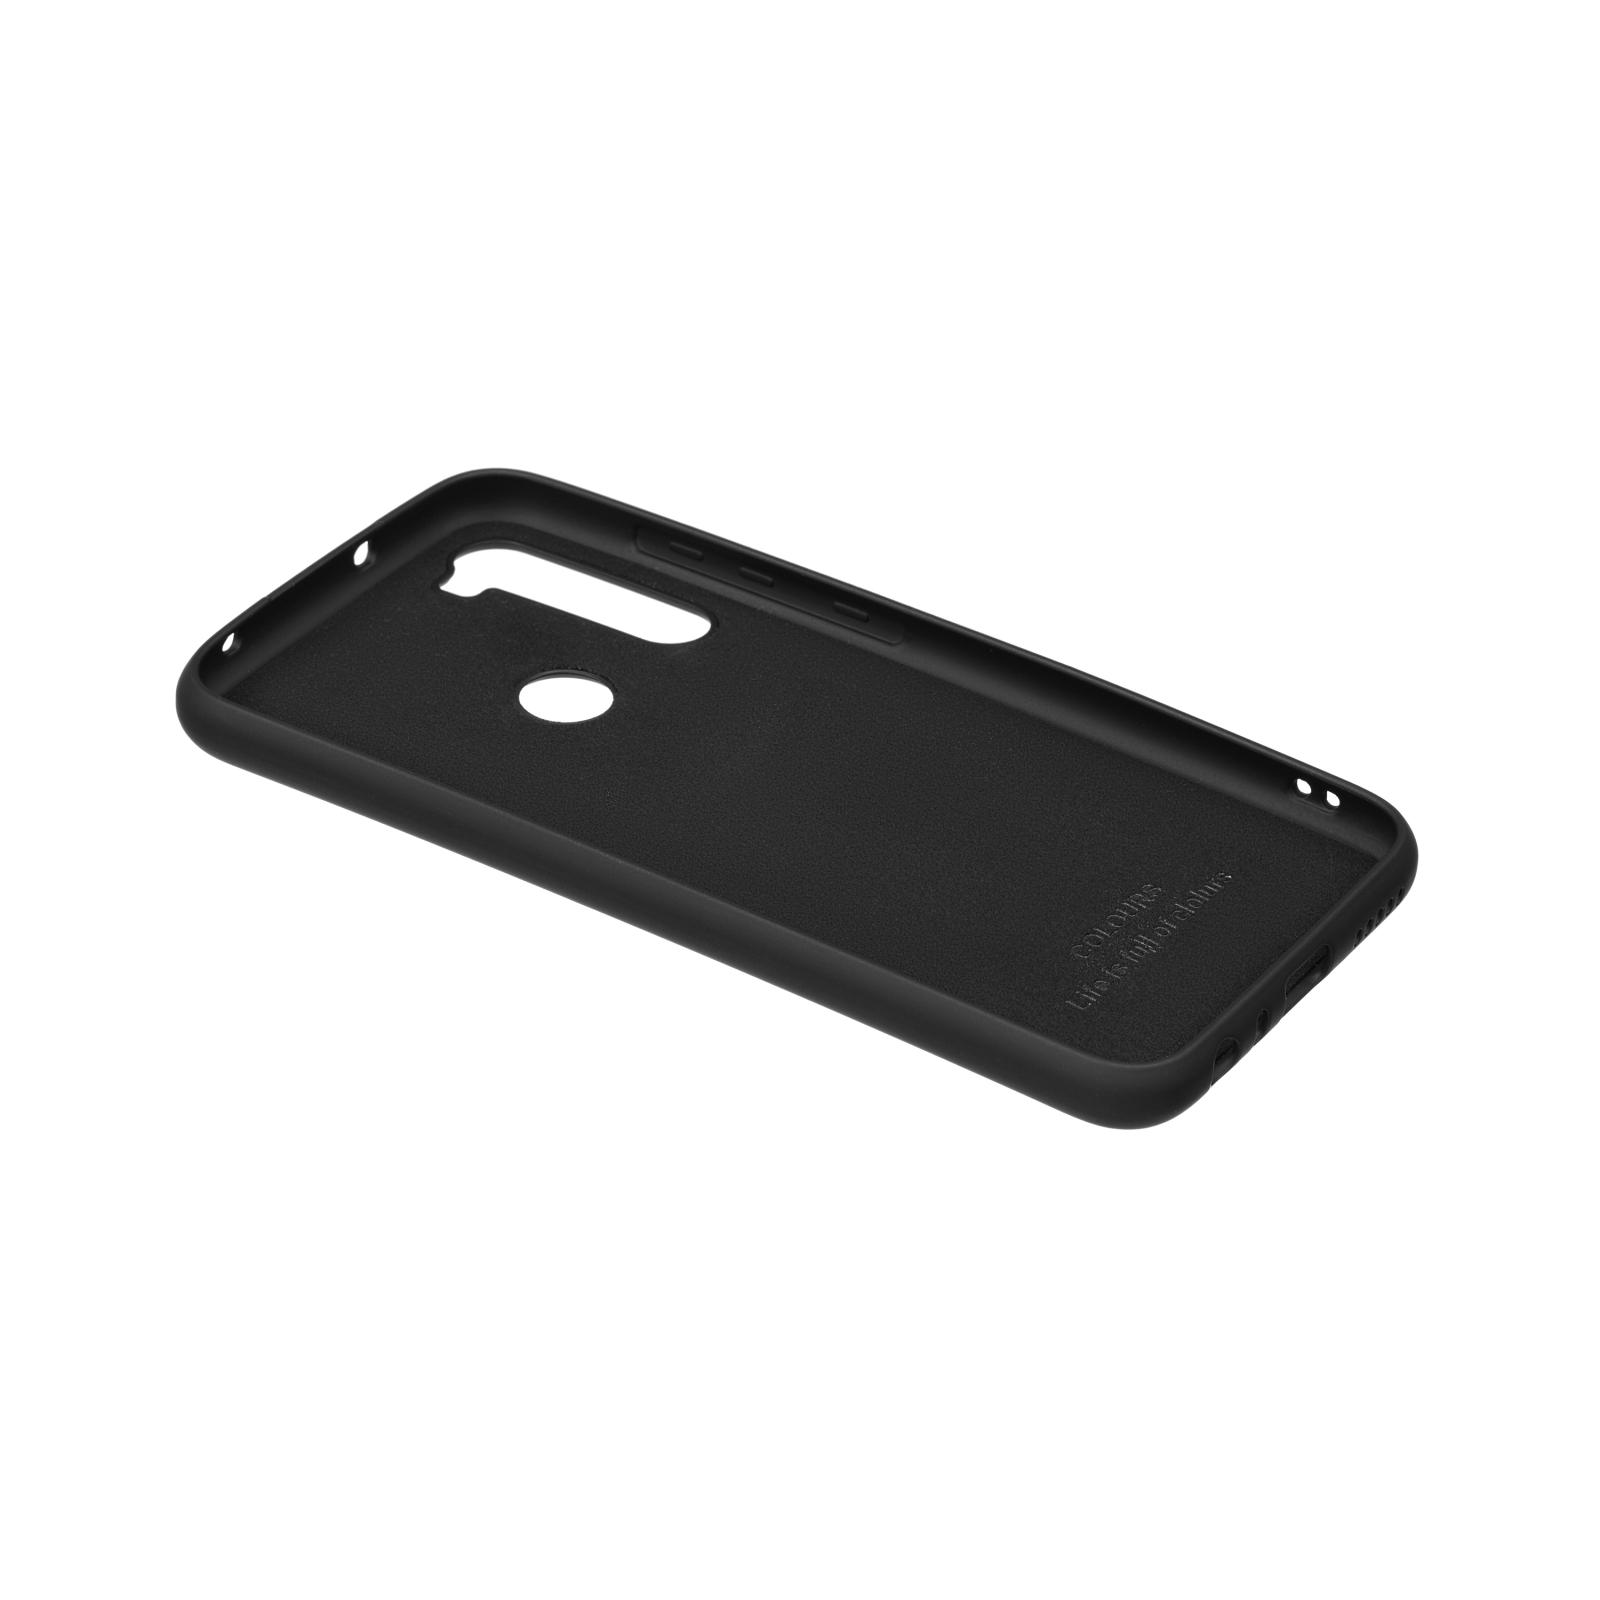 Чехол для моб. телефона 2E Xiaomi Redmi Note 8, Soft feeling, Black (2E-MI-N8-NKSF-BK) изображение 2